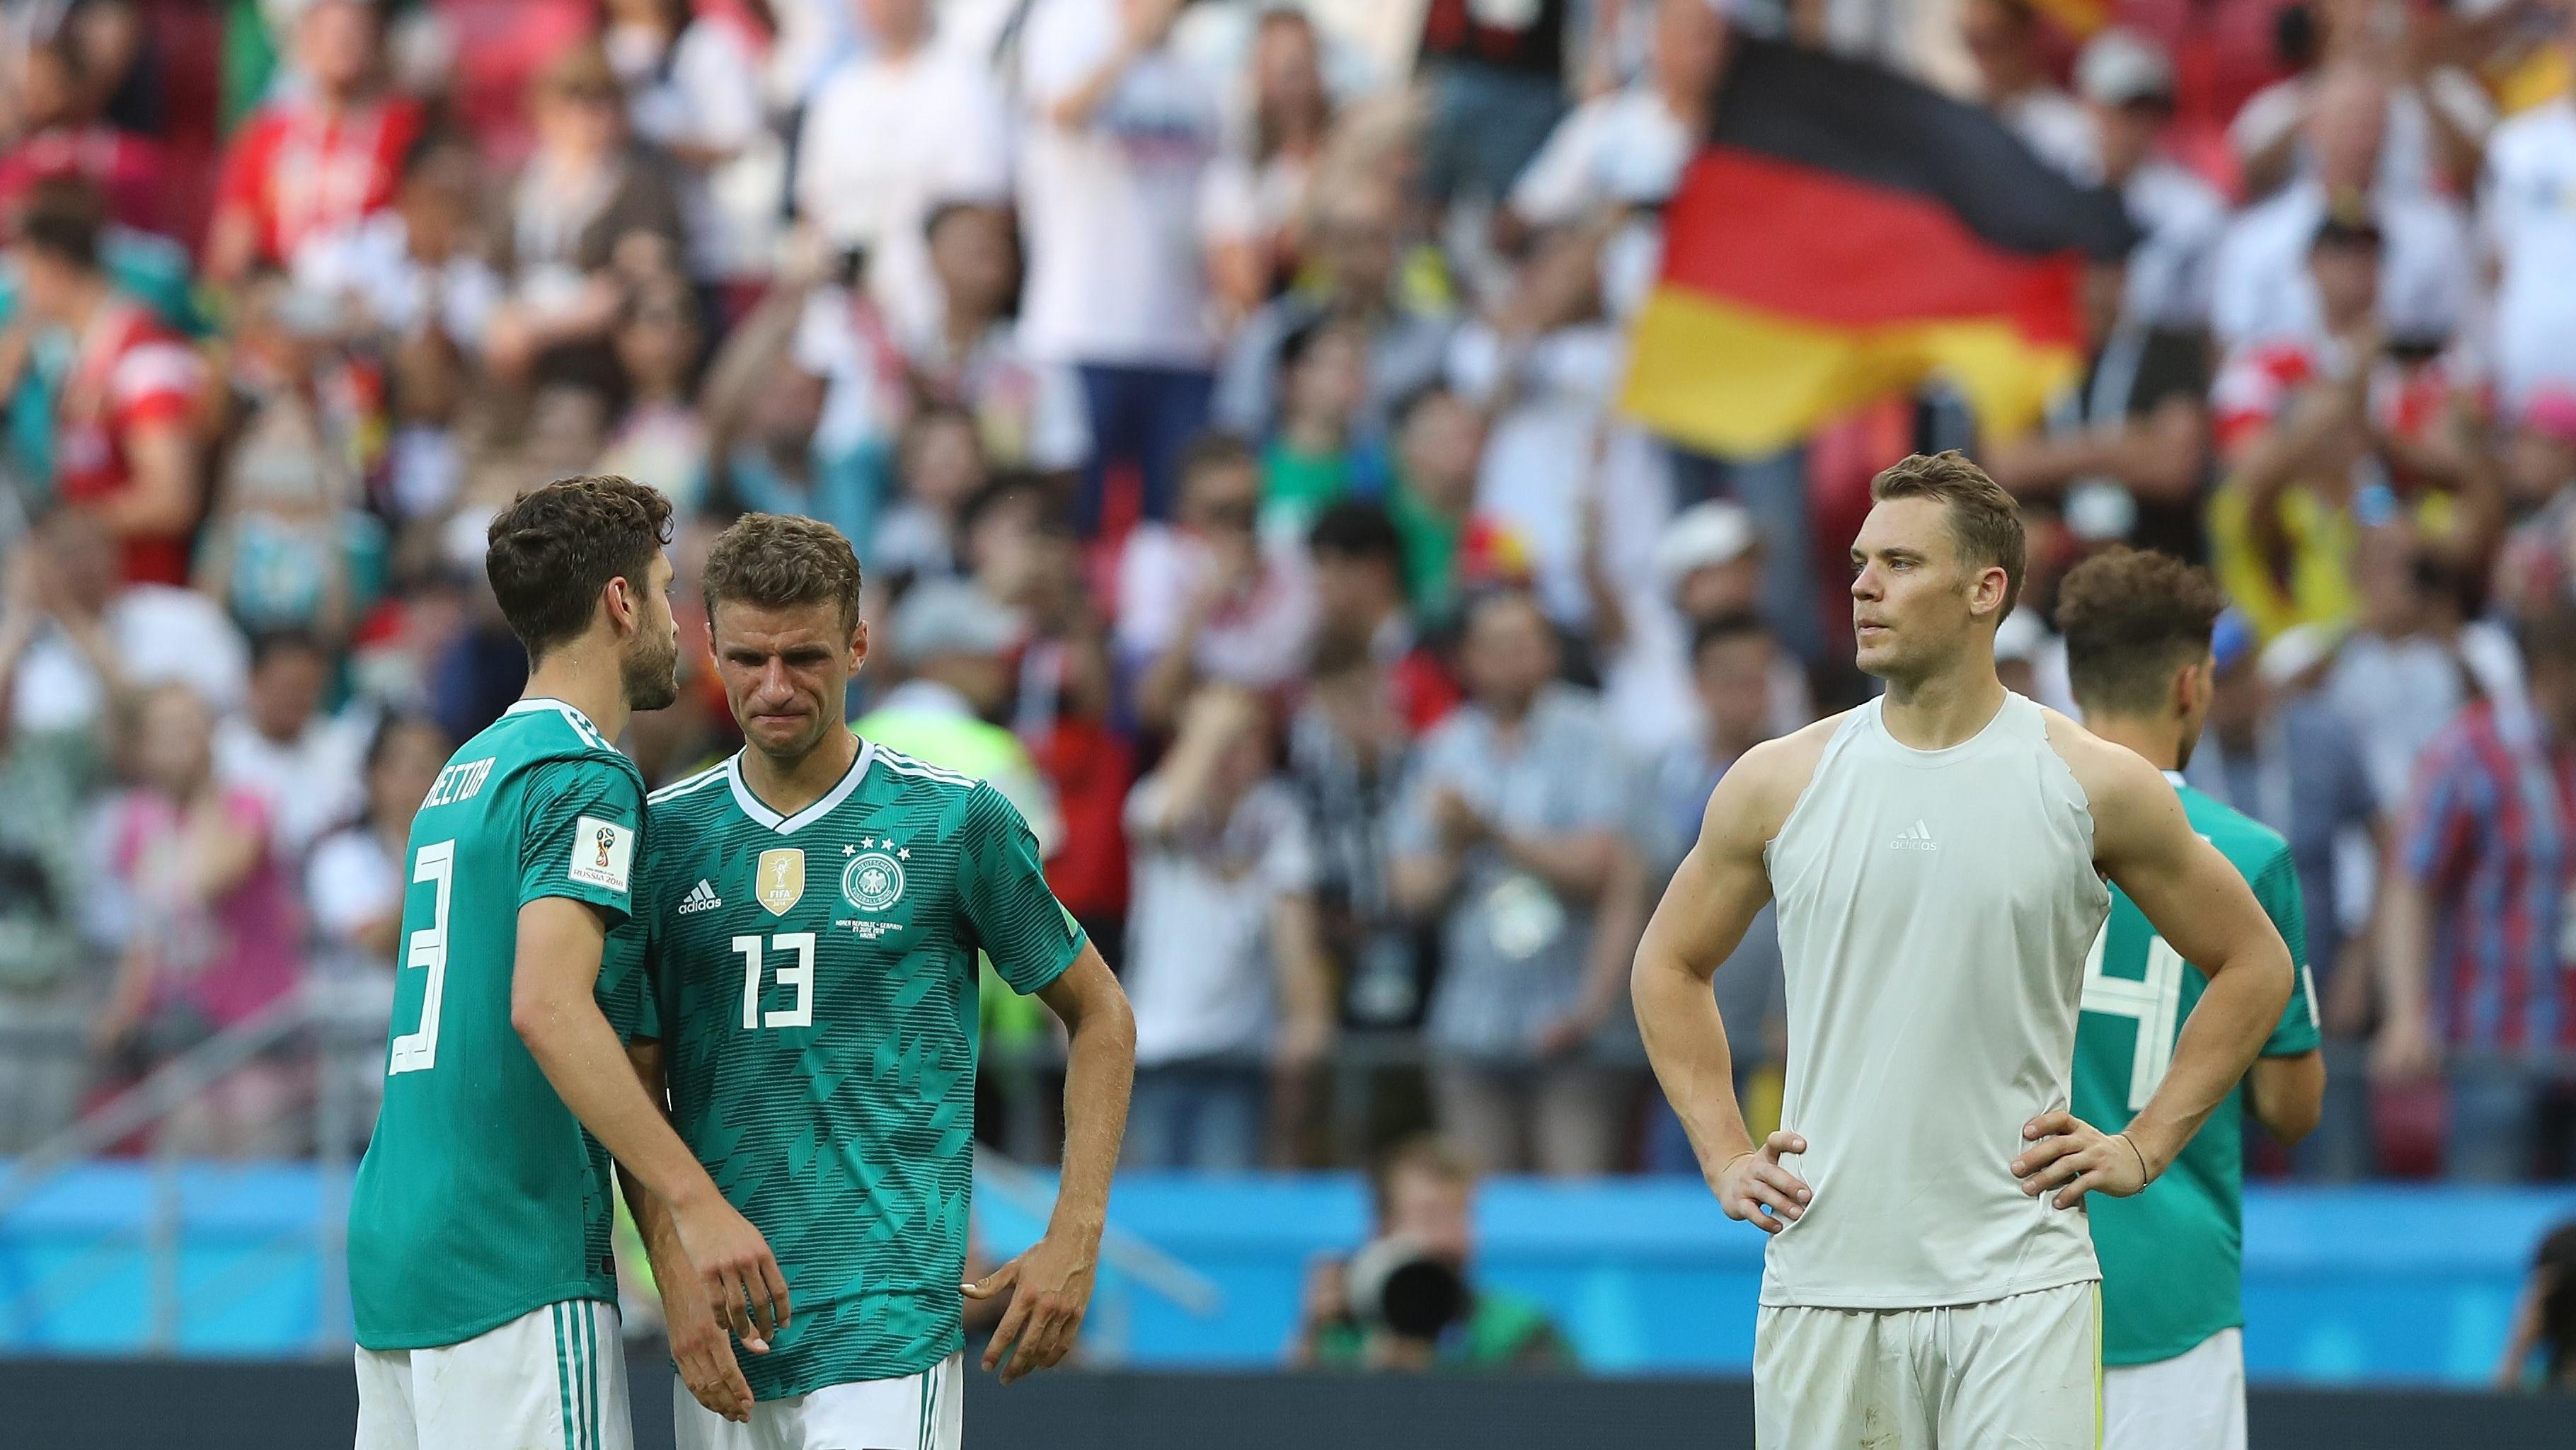 Enttäuschung nach dem WM-Aus